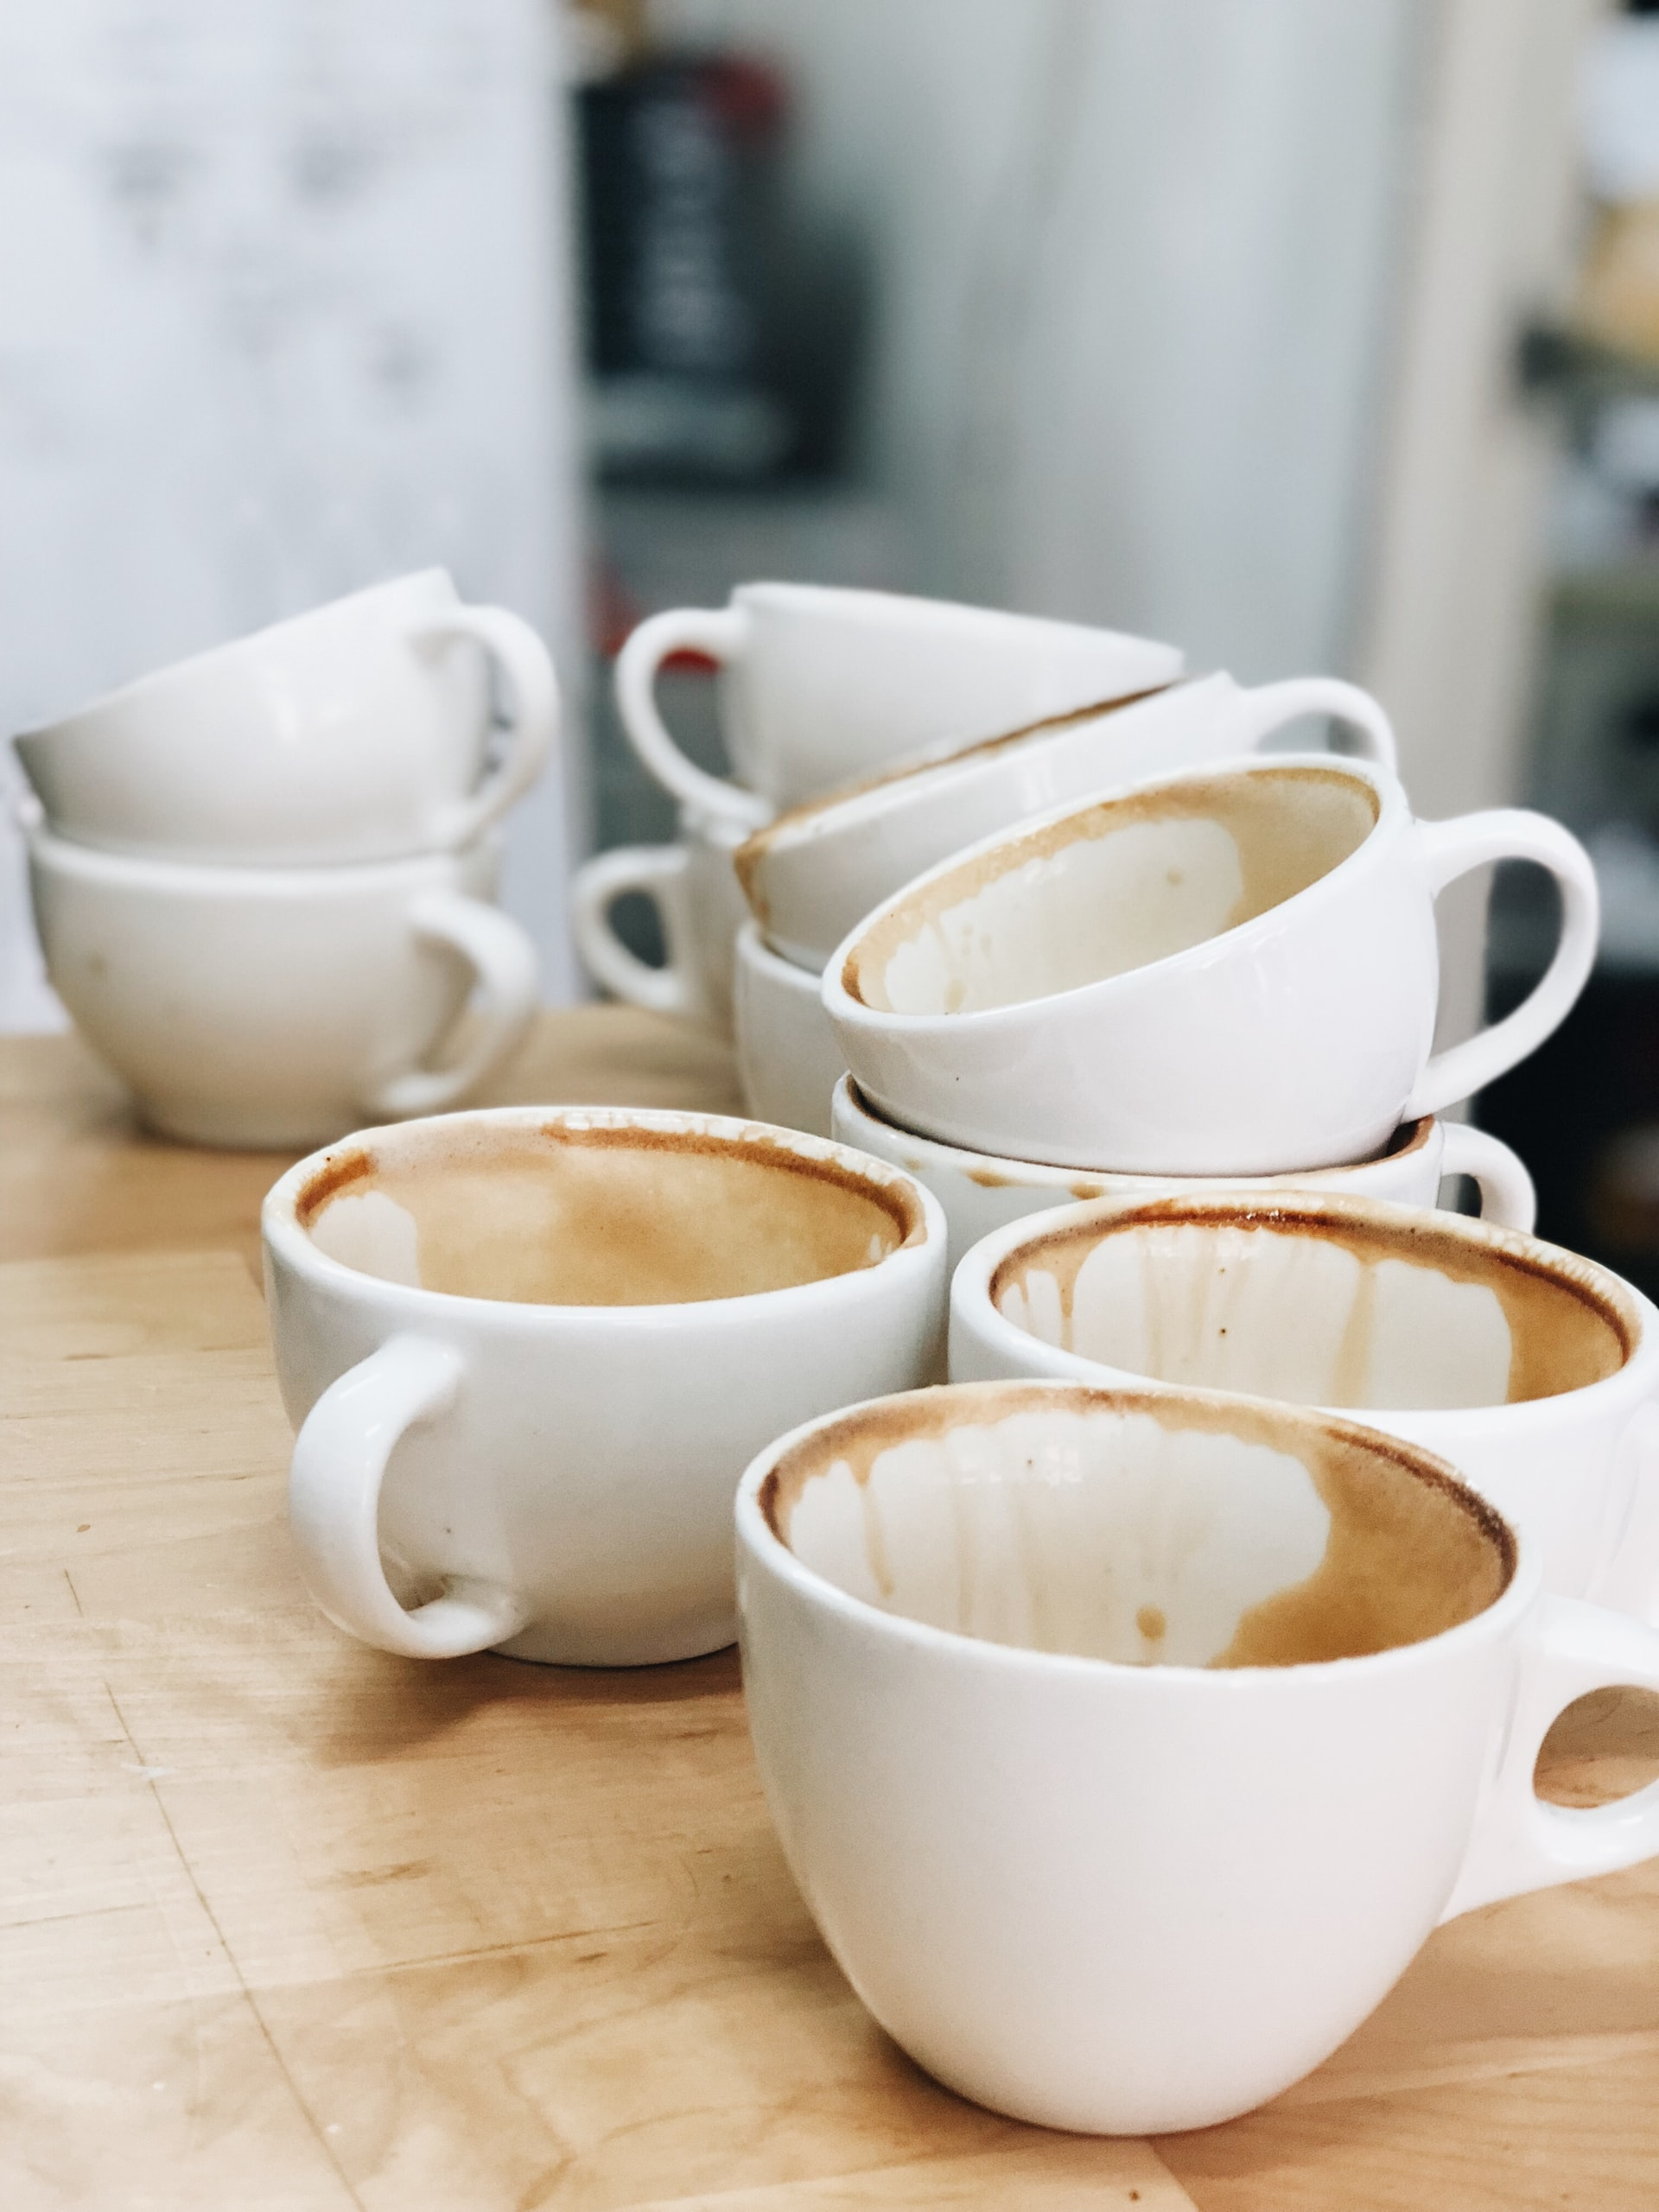 Kaffee Detox -erhöhter Kaffee-Konsum